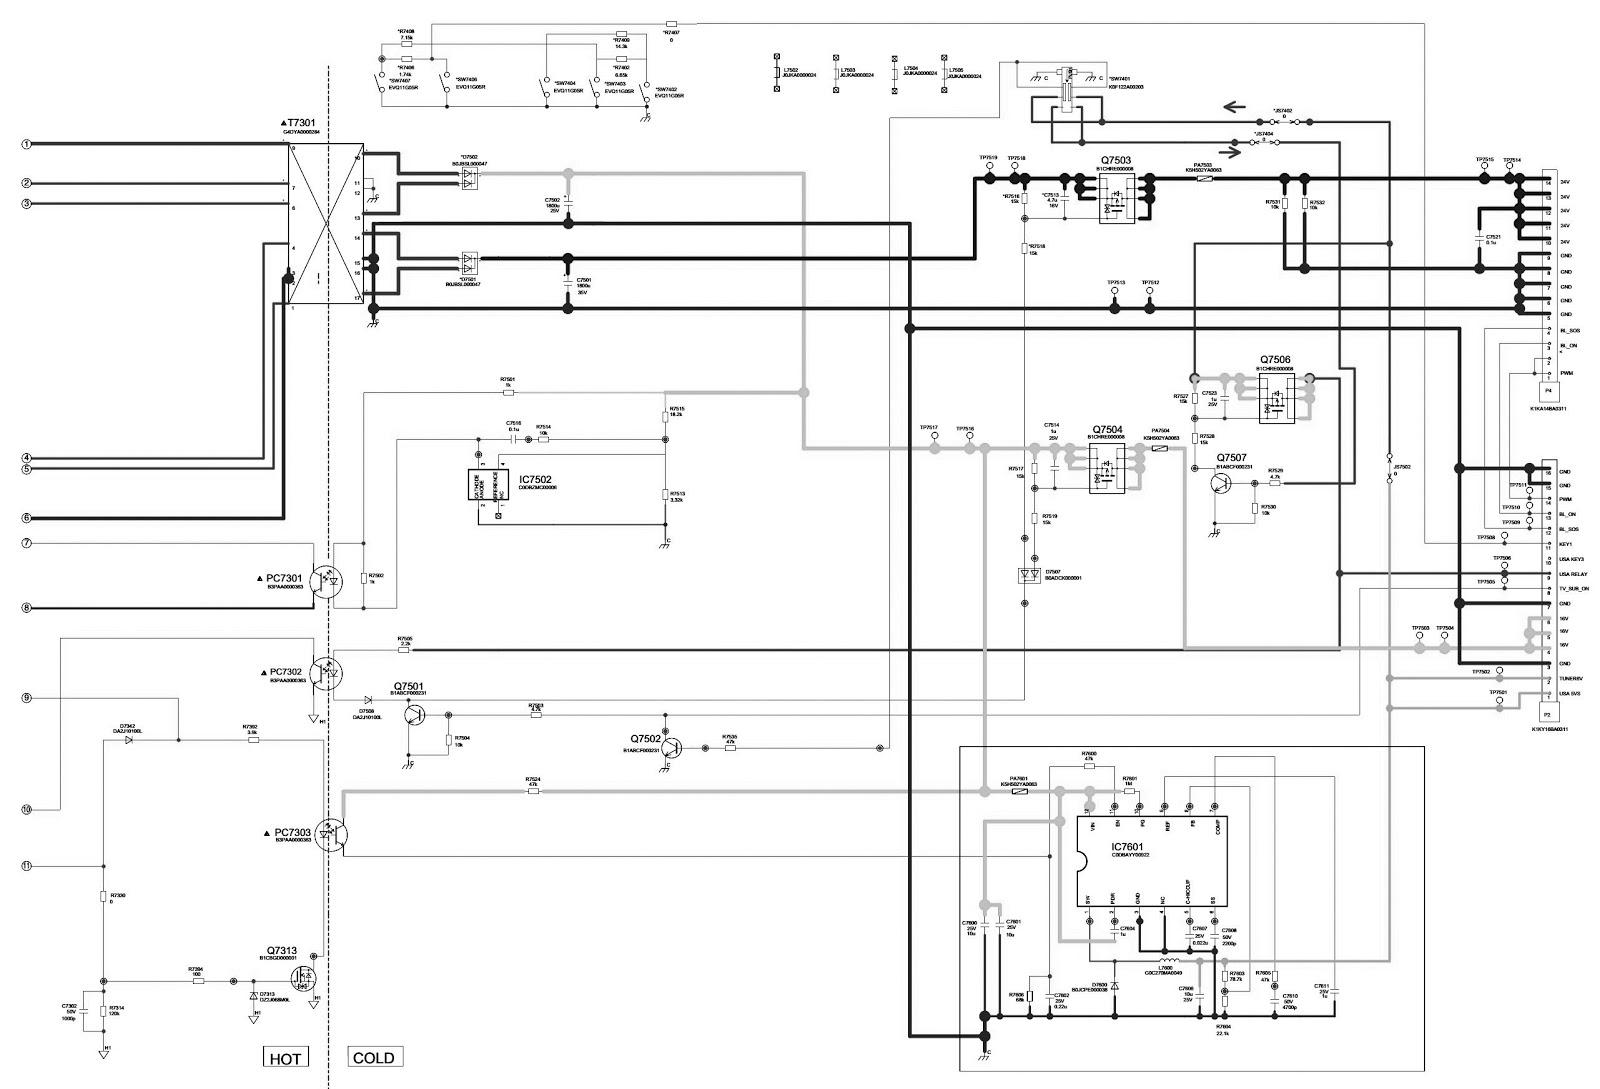 TNPA5364BJ  SMPS SCHEMATIC  PANASONIC TH L32X30C  LCD TV